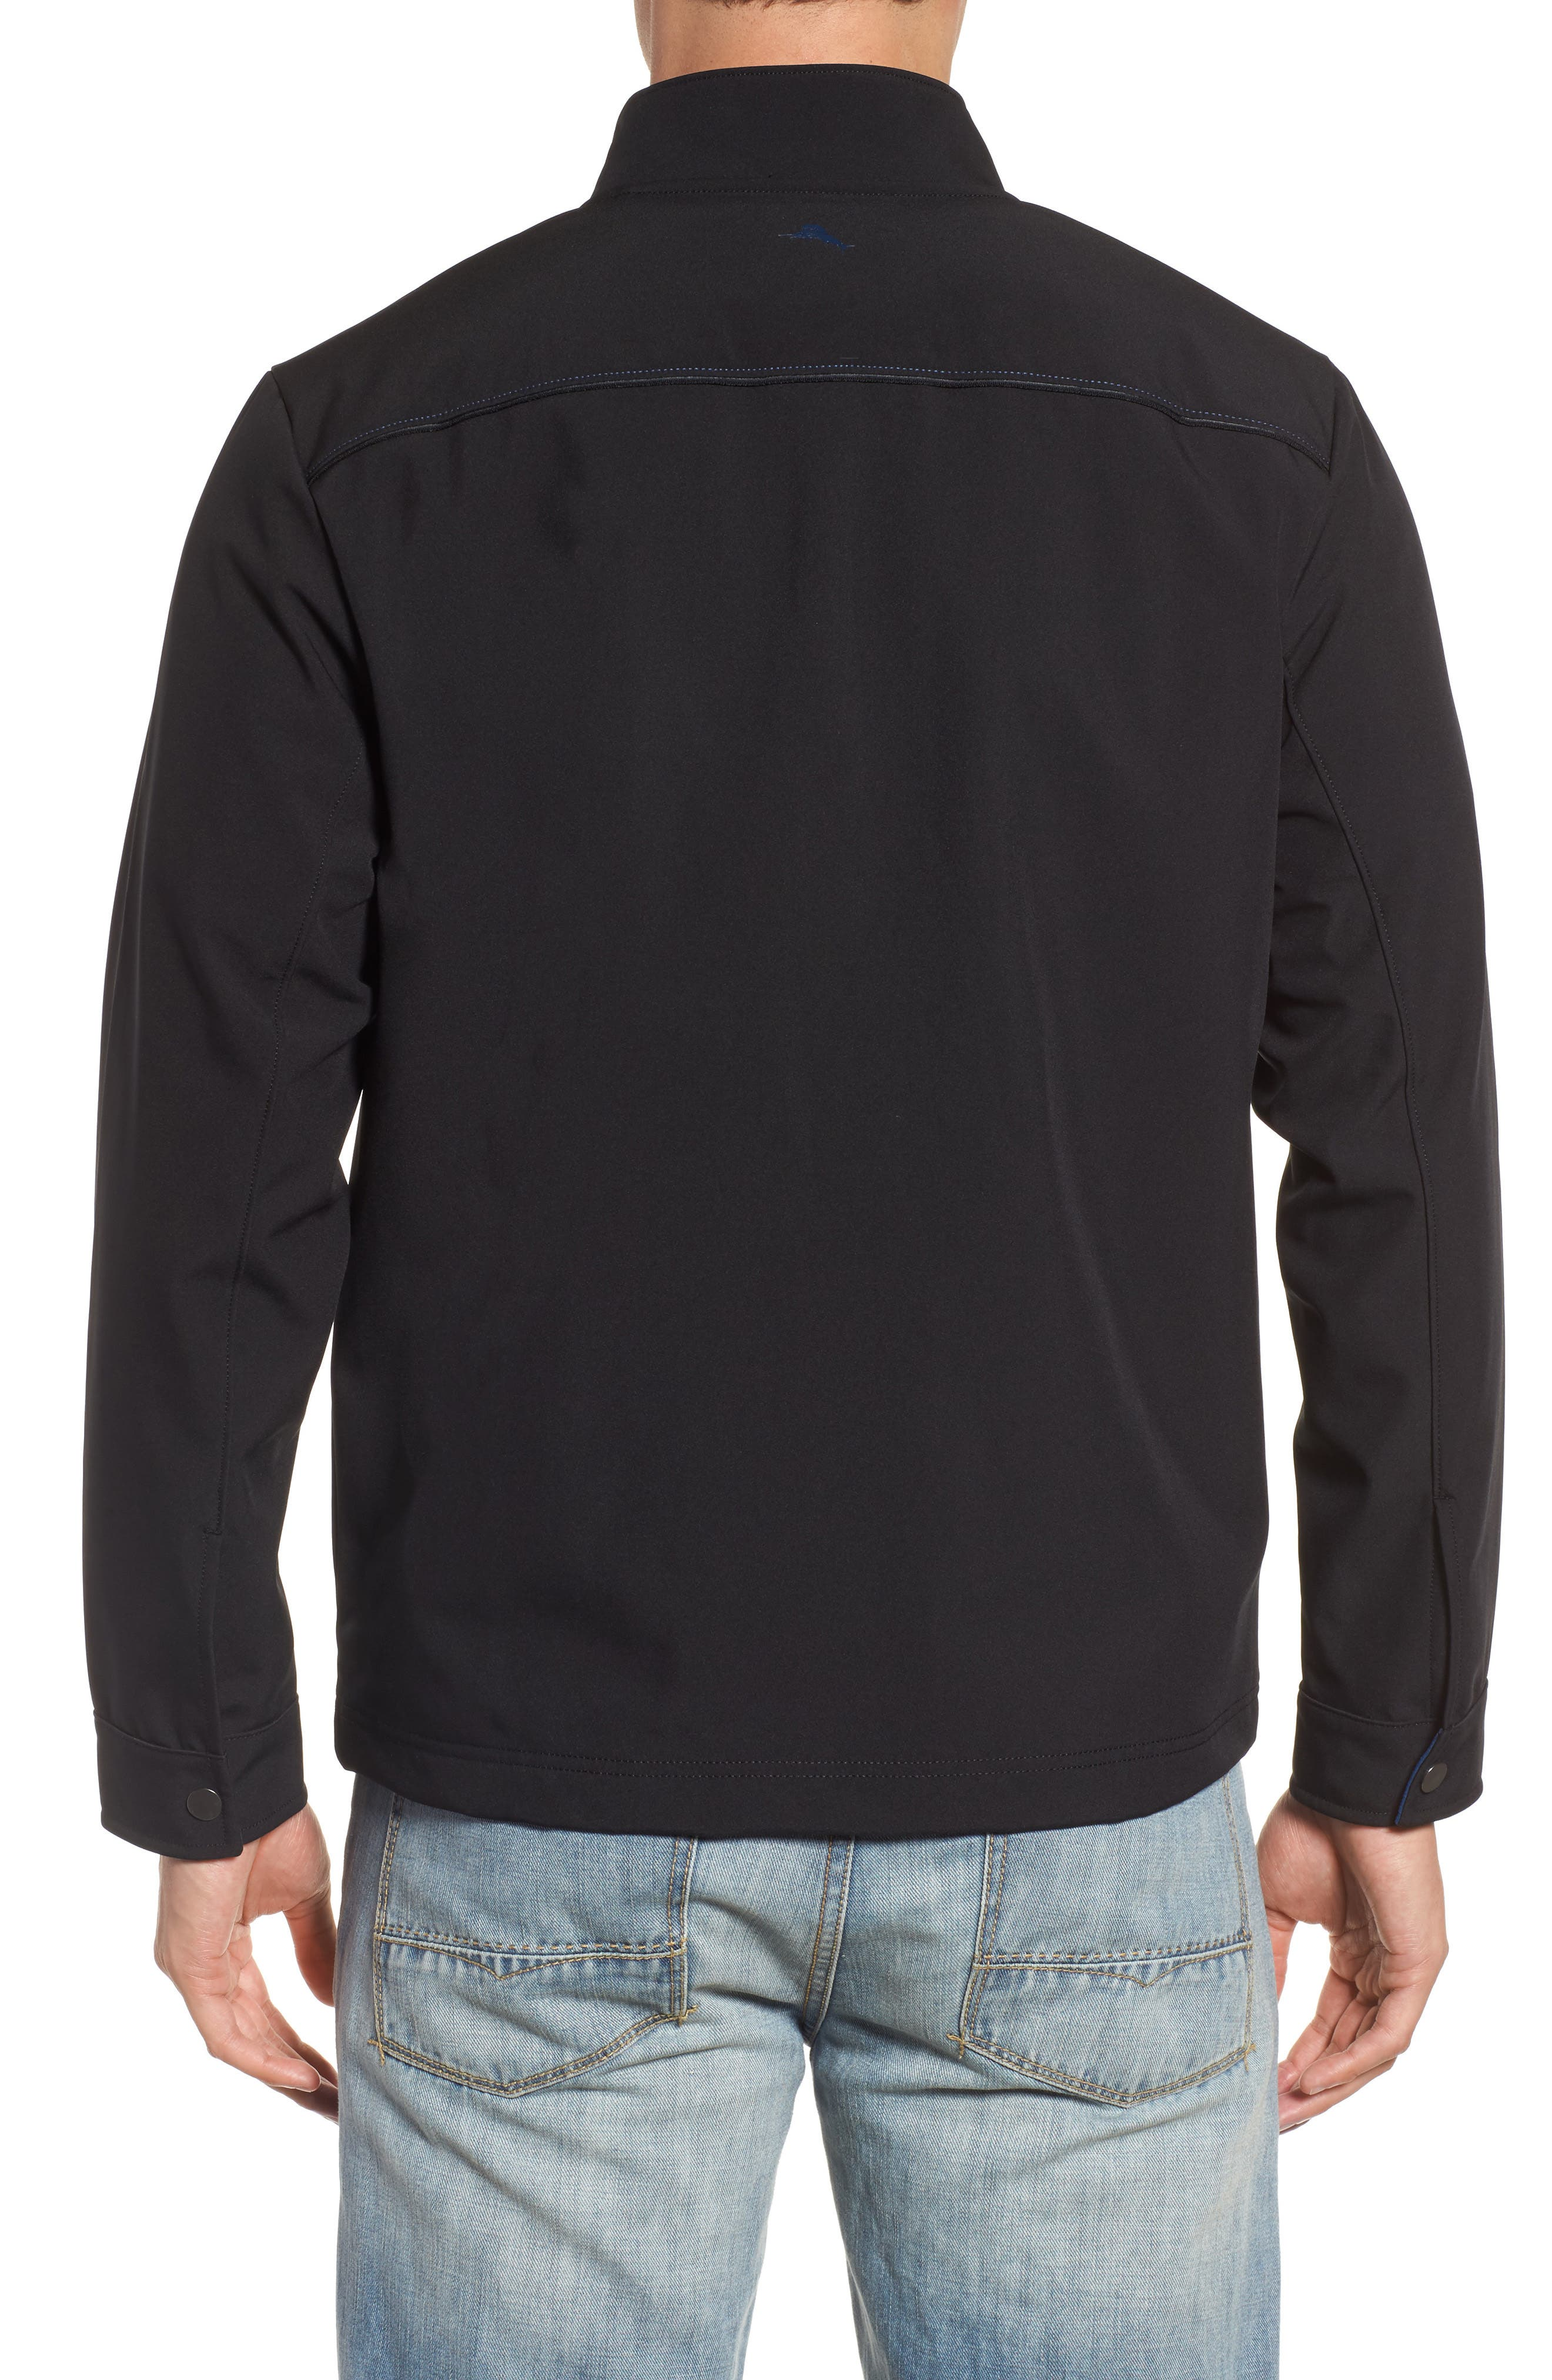 Downswing Zip Jacket,                             Alternate thumbnail 2, color,                             Black